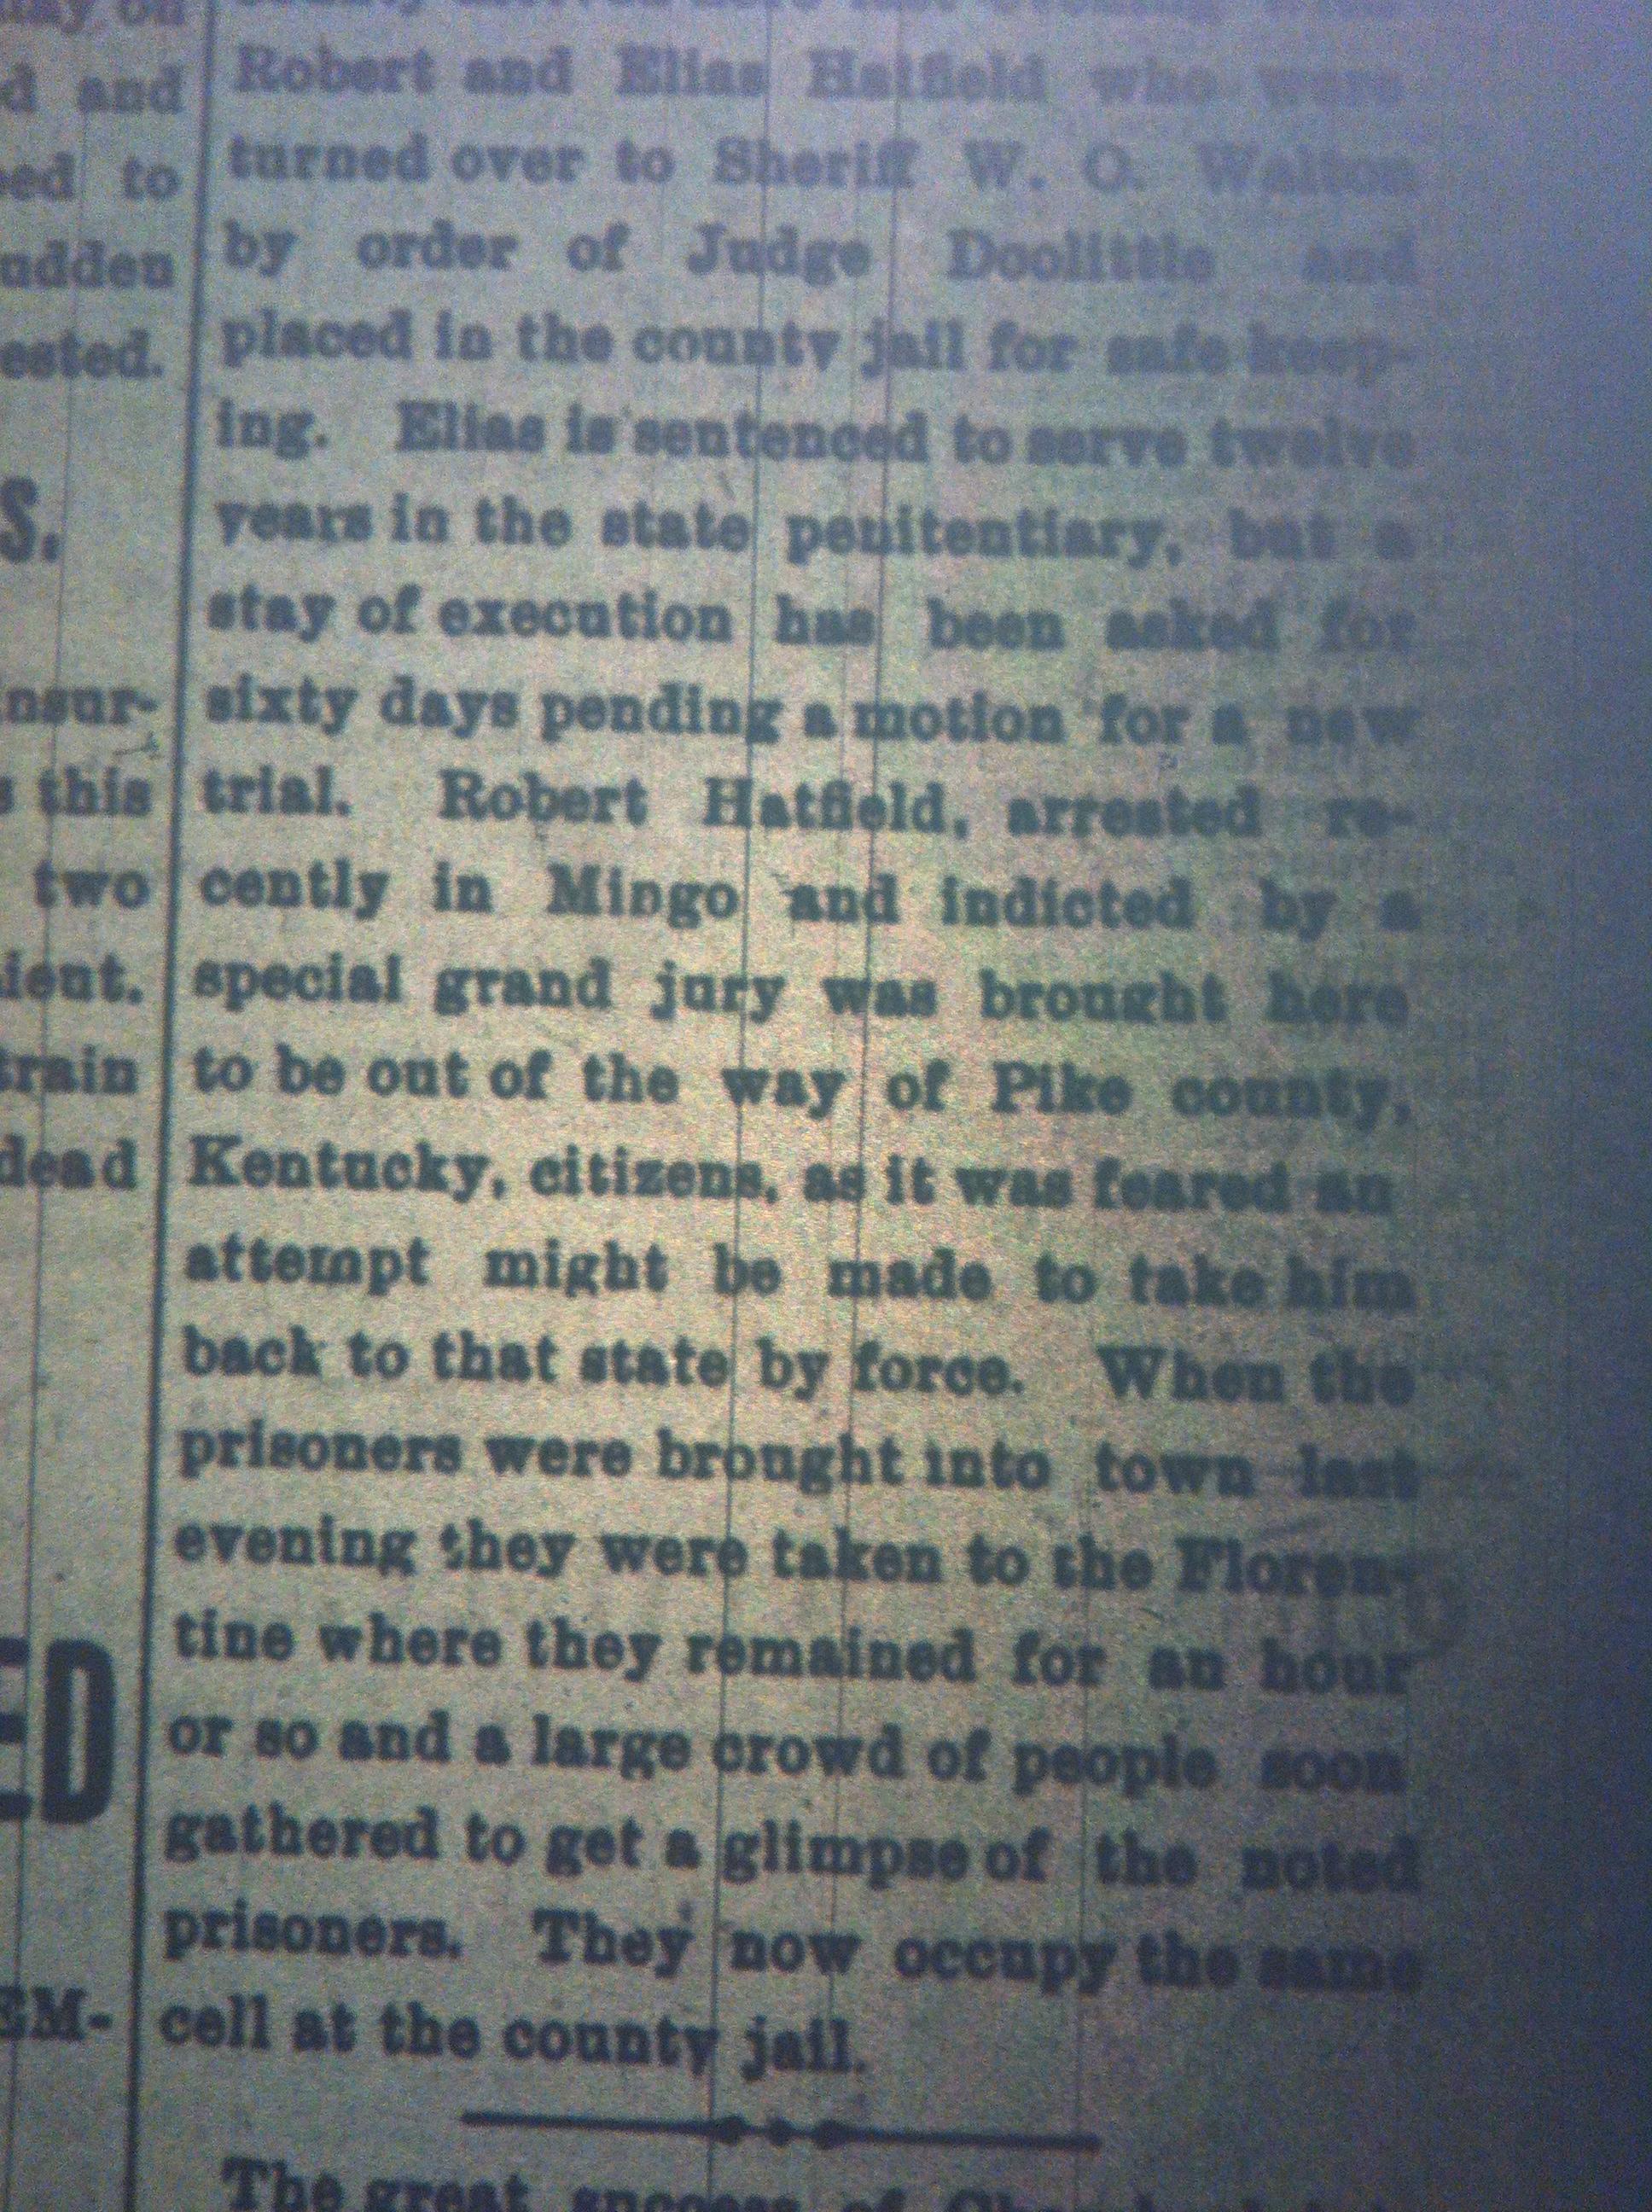 Bob and Elias Hatfield in Jail HA 09.22.1899 2